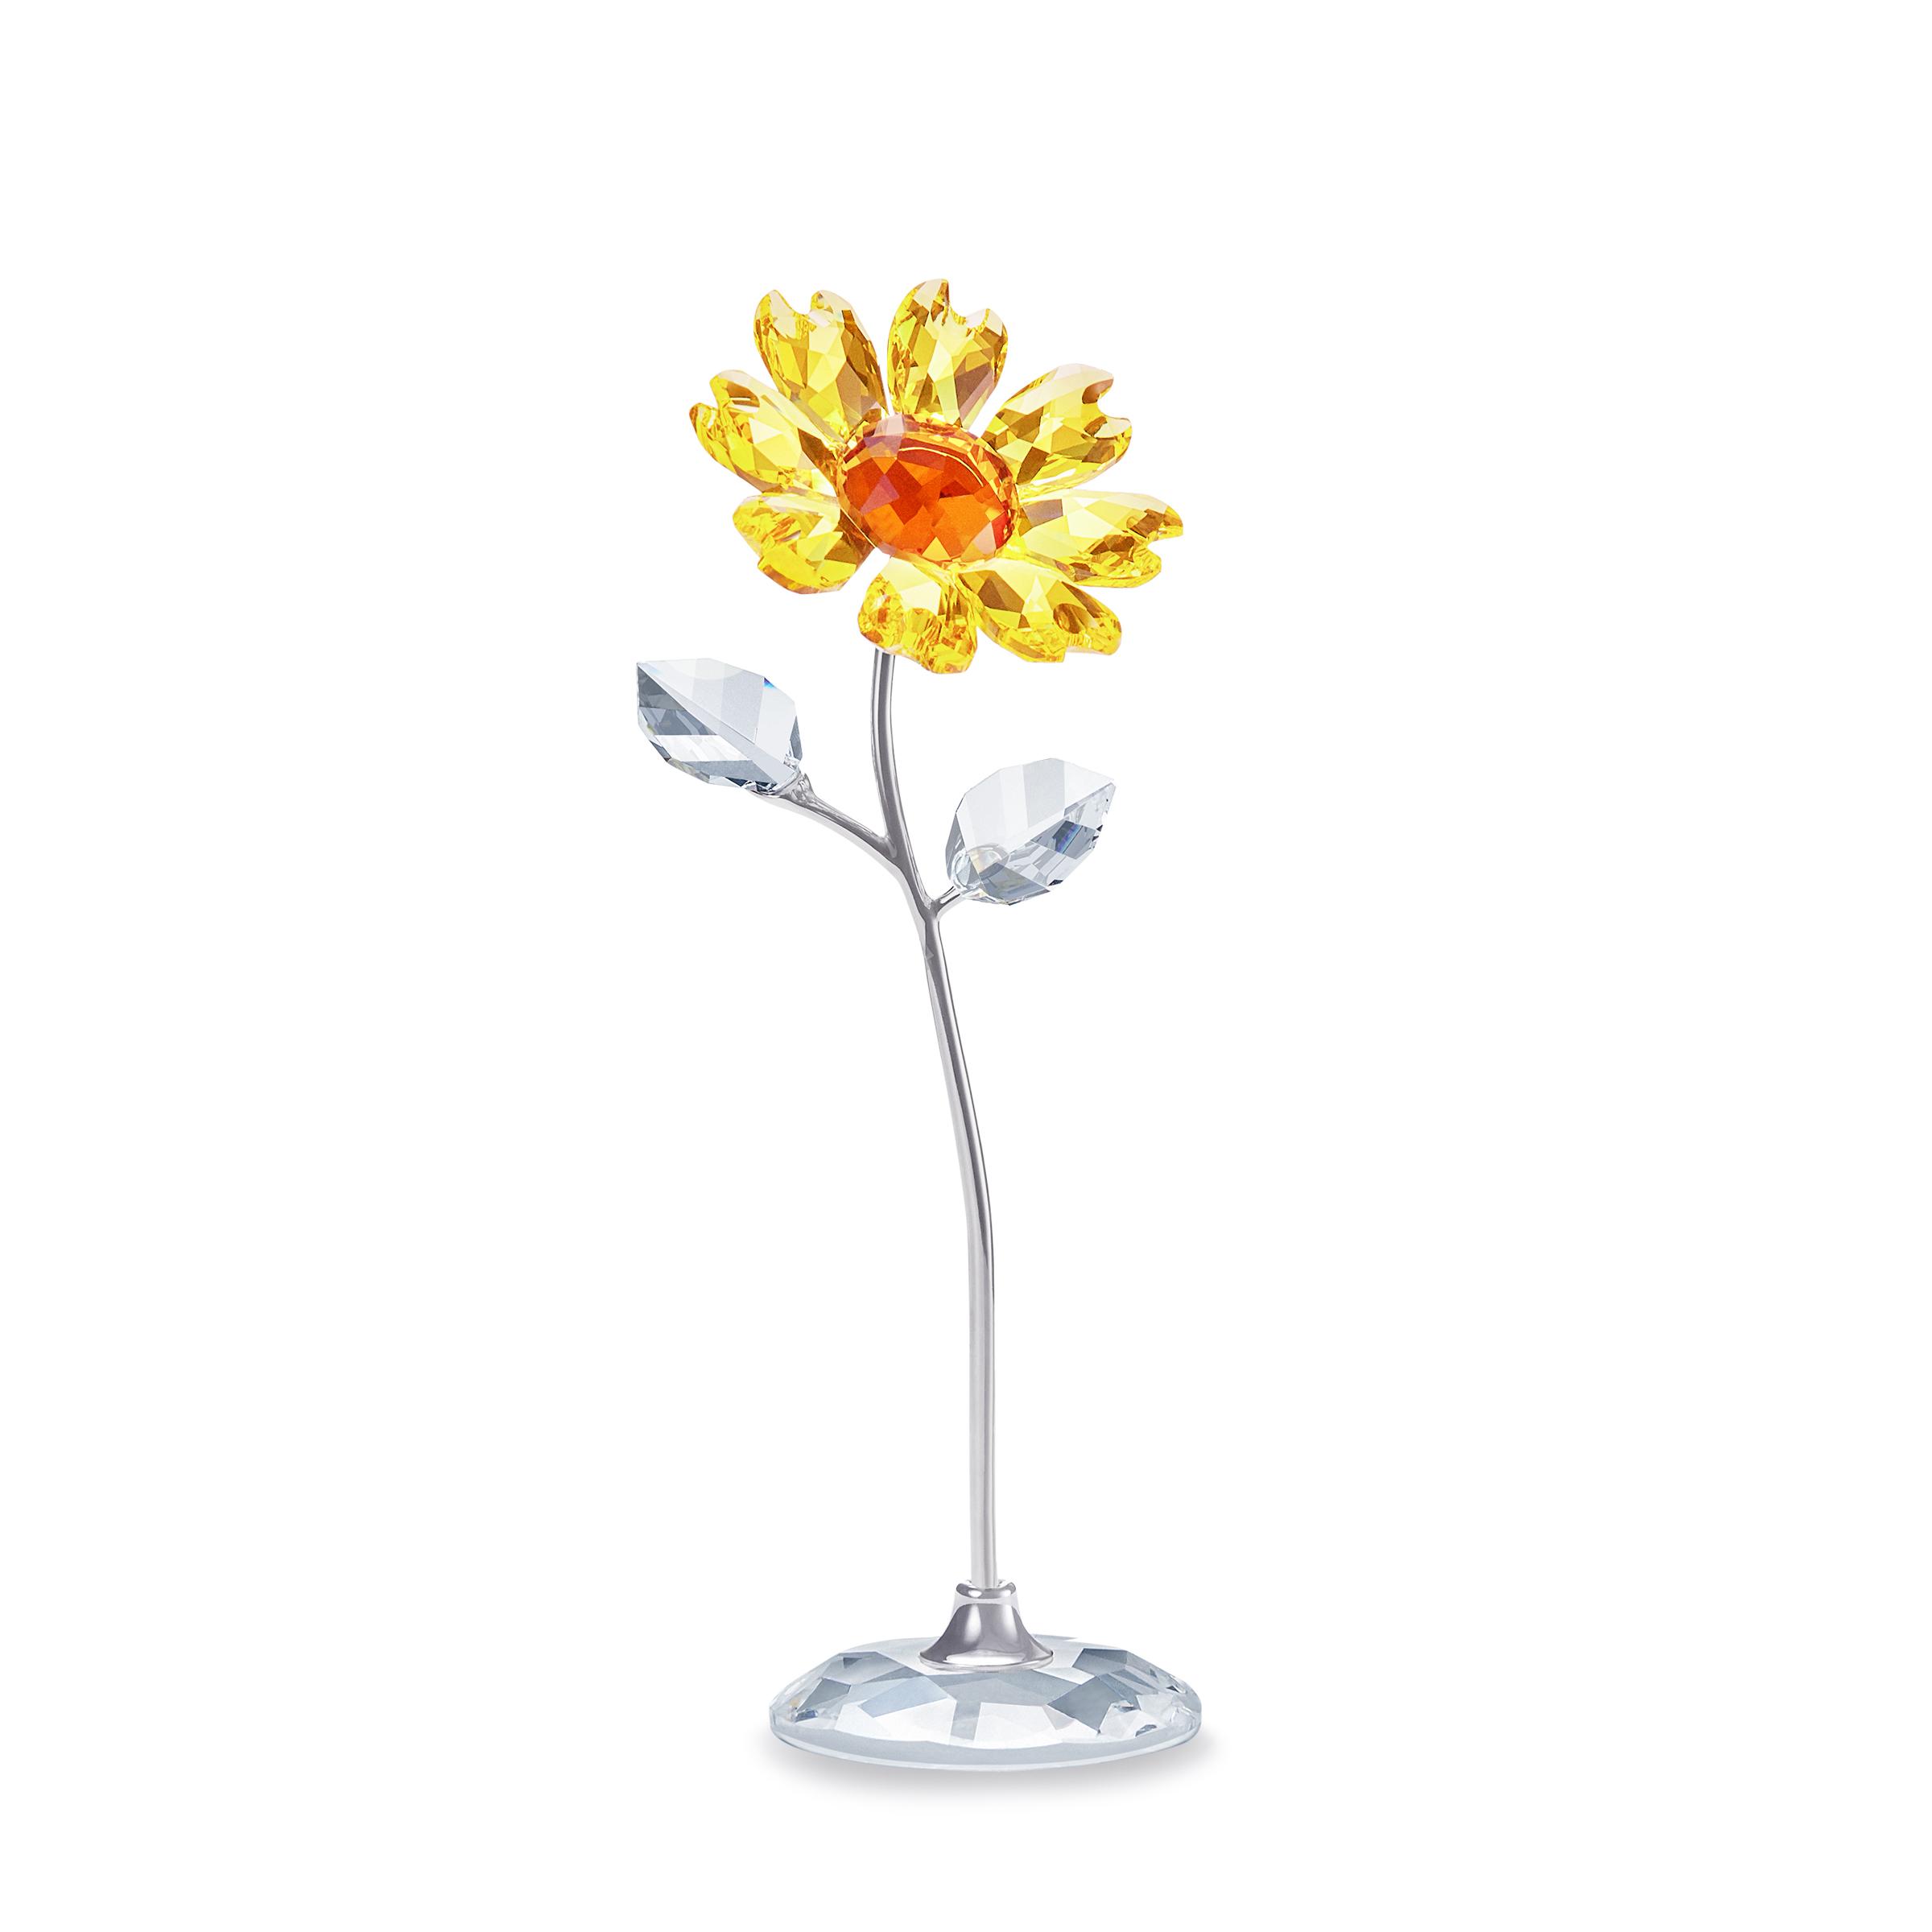 Rêves Fleuris – Tournesol, grand modèle Swarovski